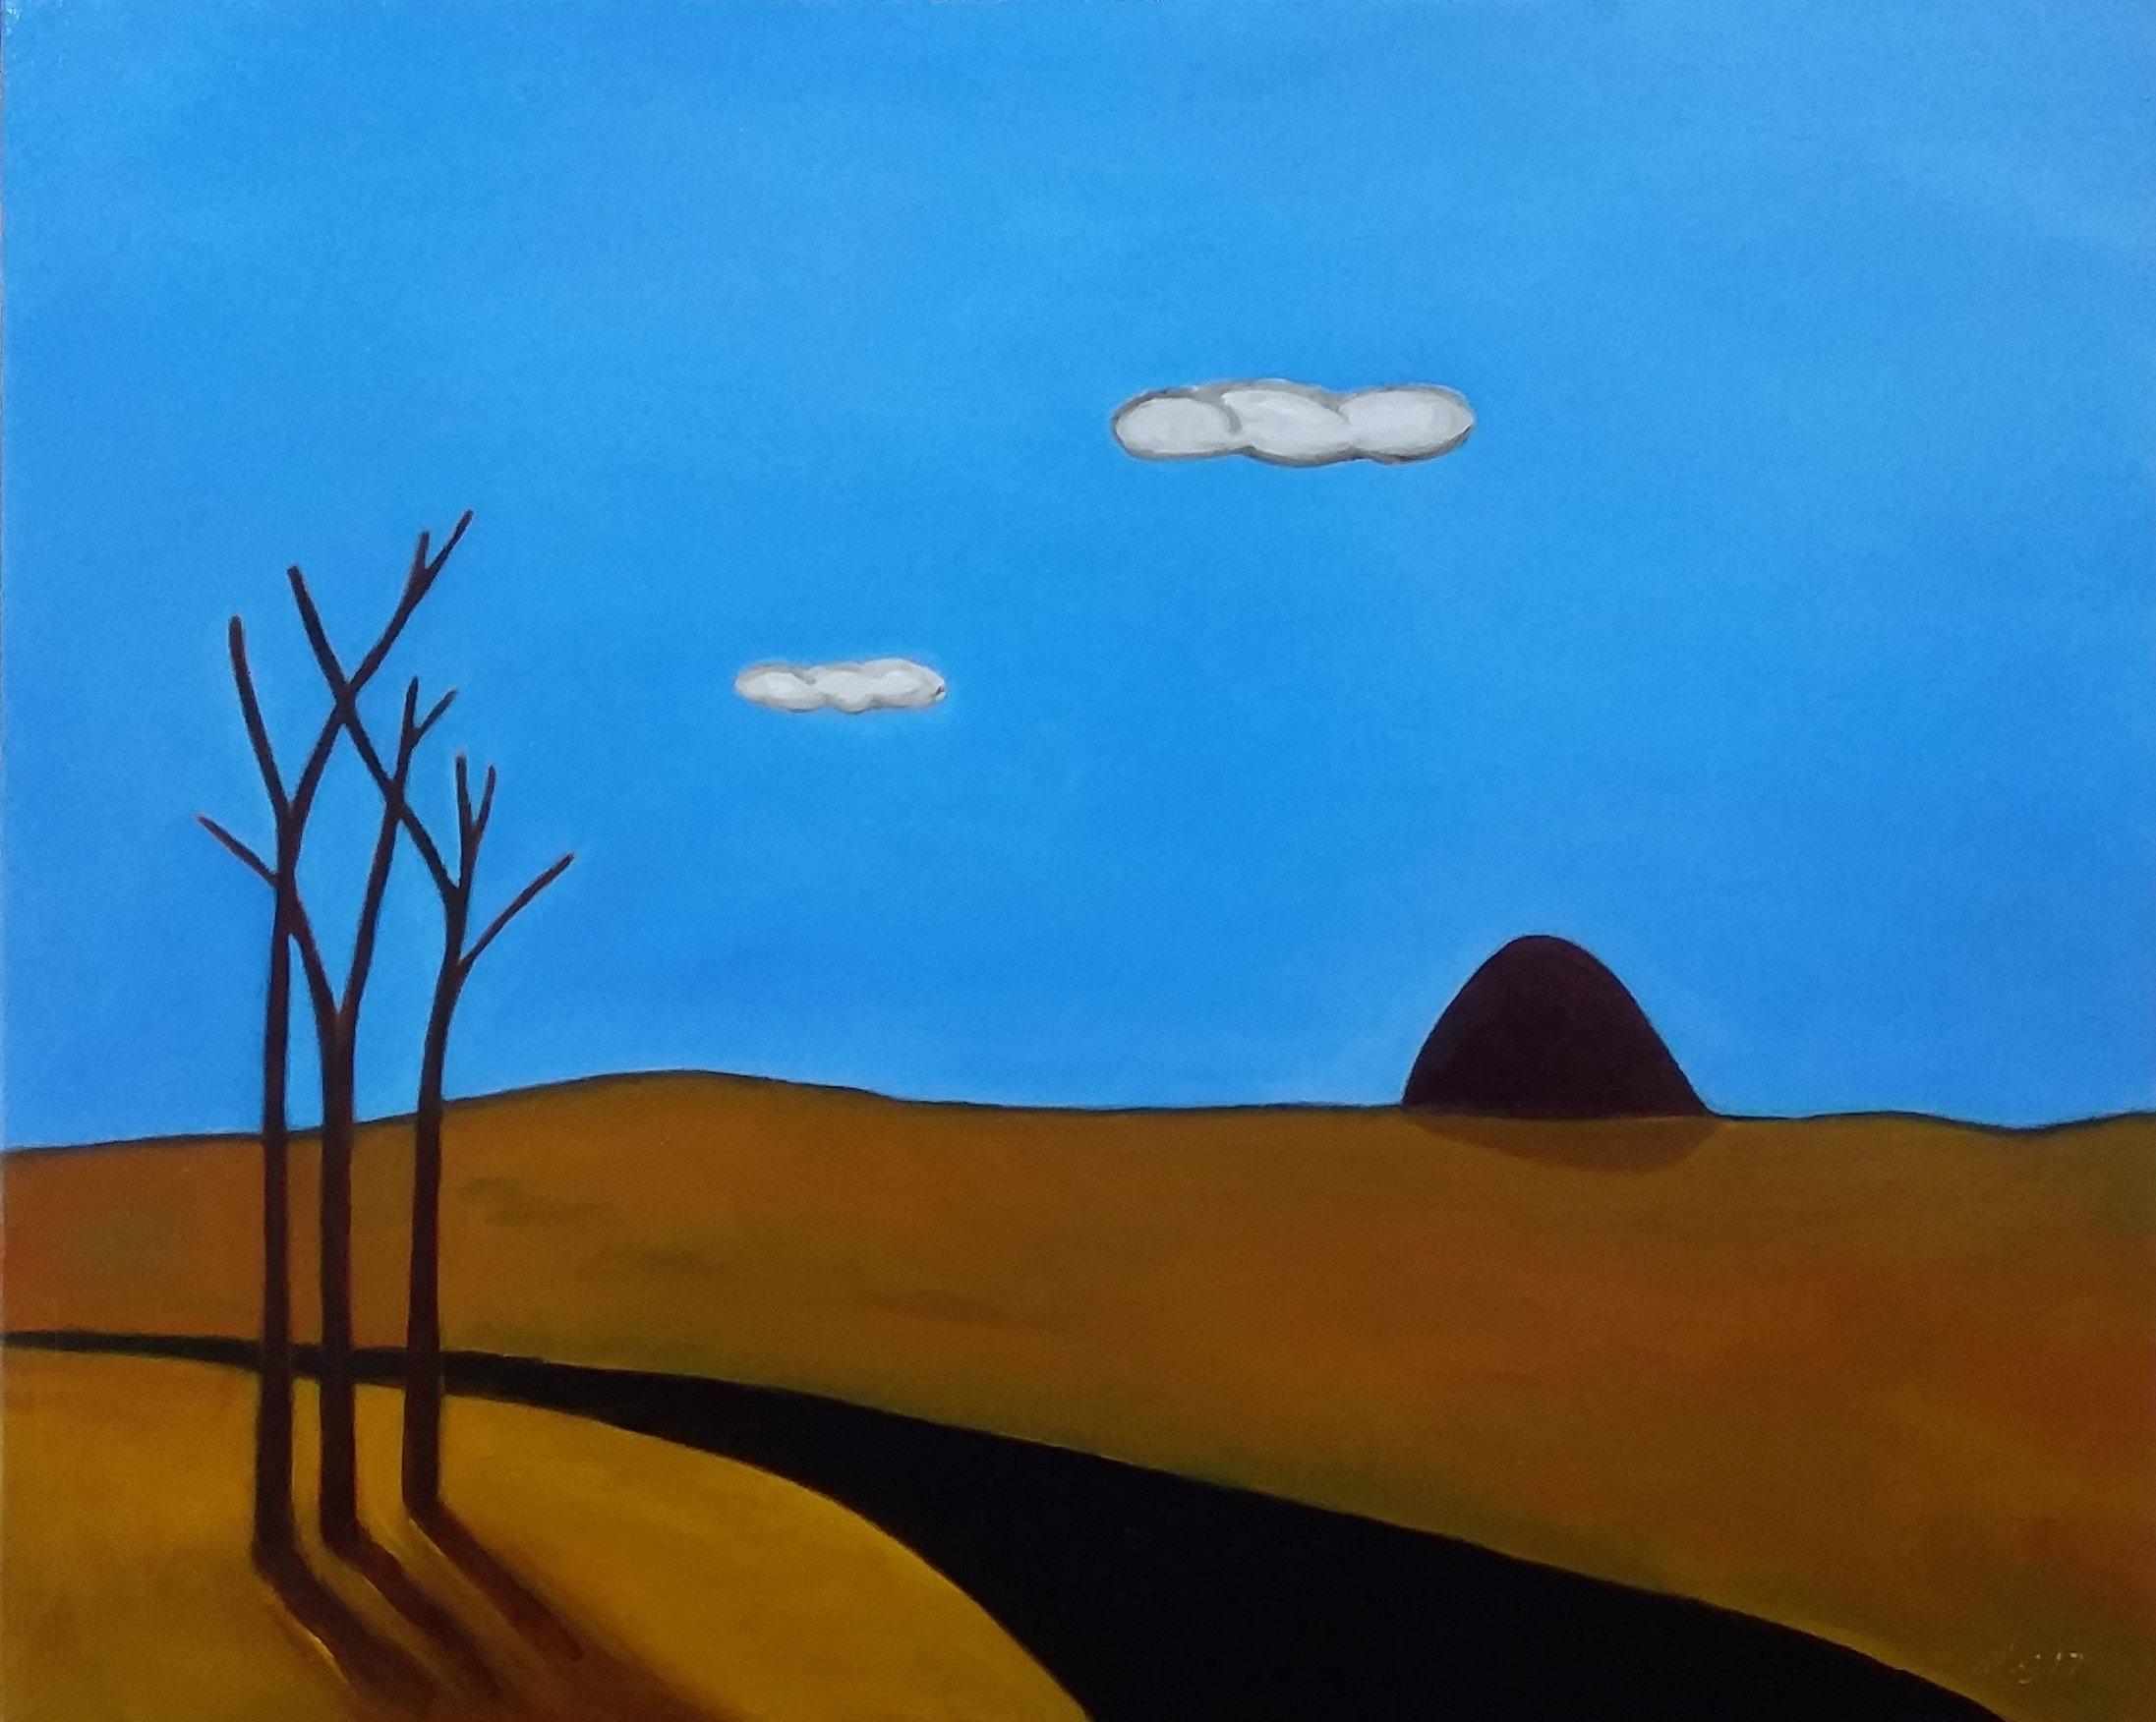 Malcolm Sands  Wollemi Landform Kandos  2018 oil on canvas 64 x 79.5cm $950.00